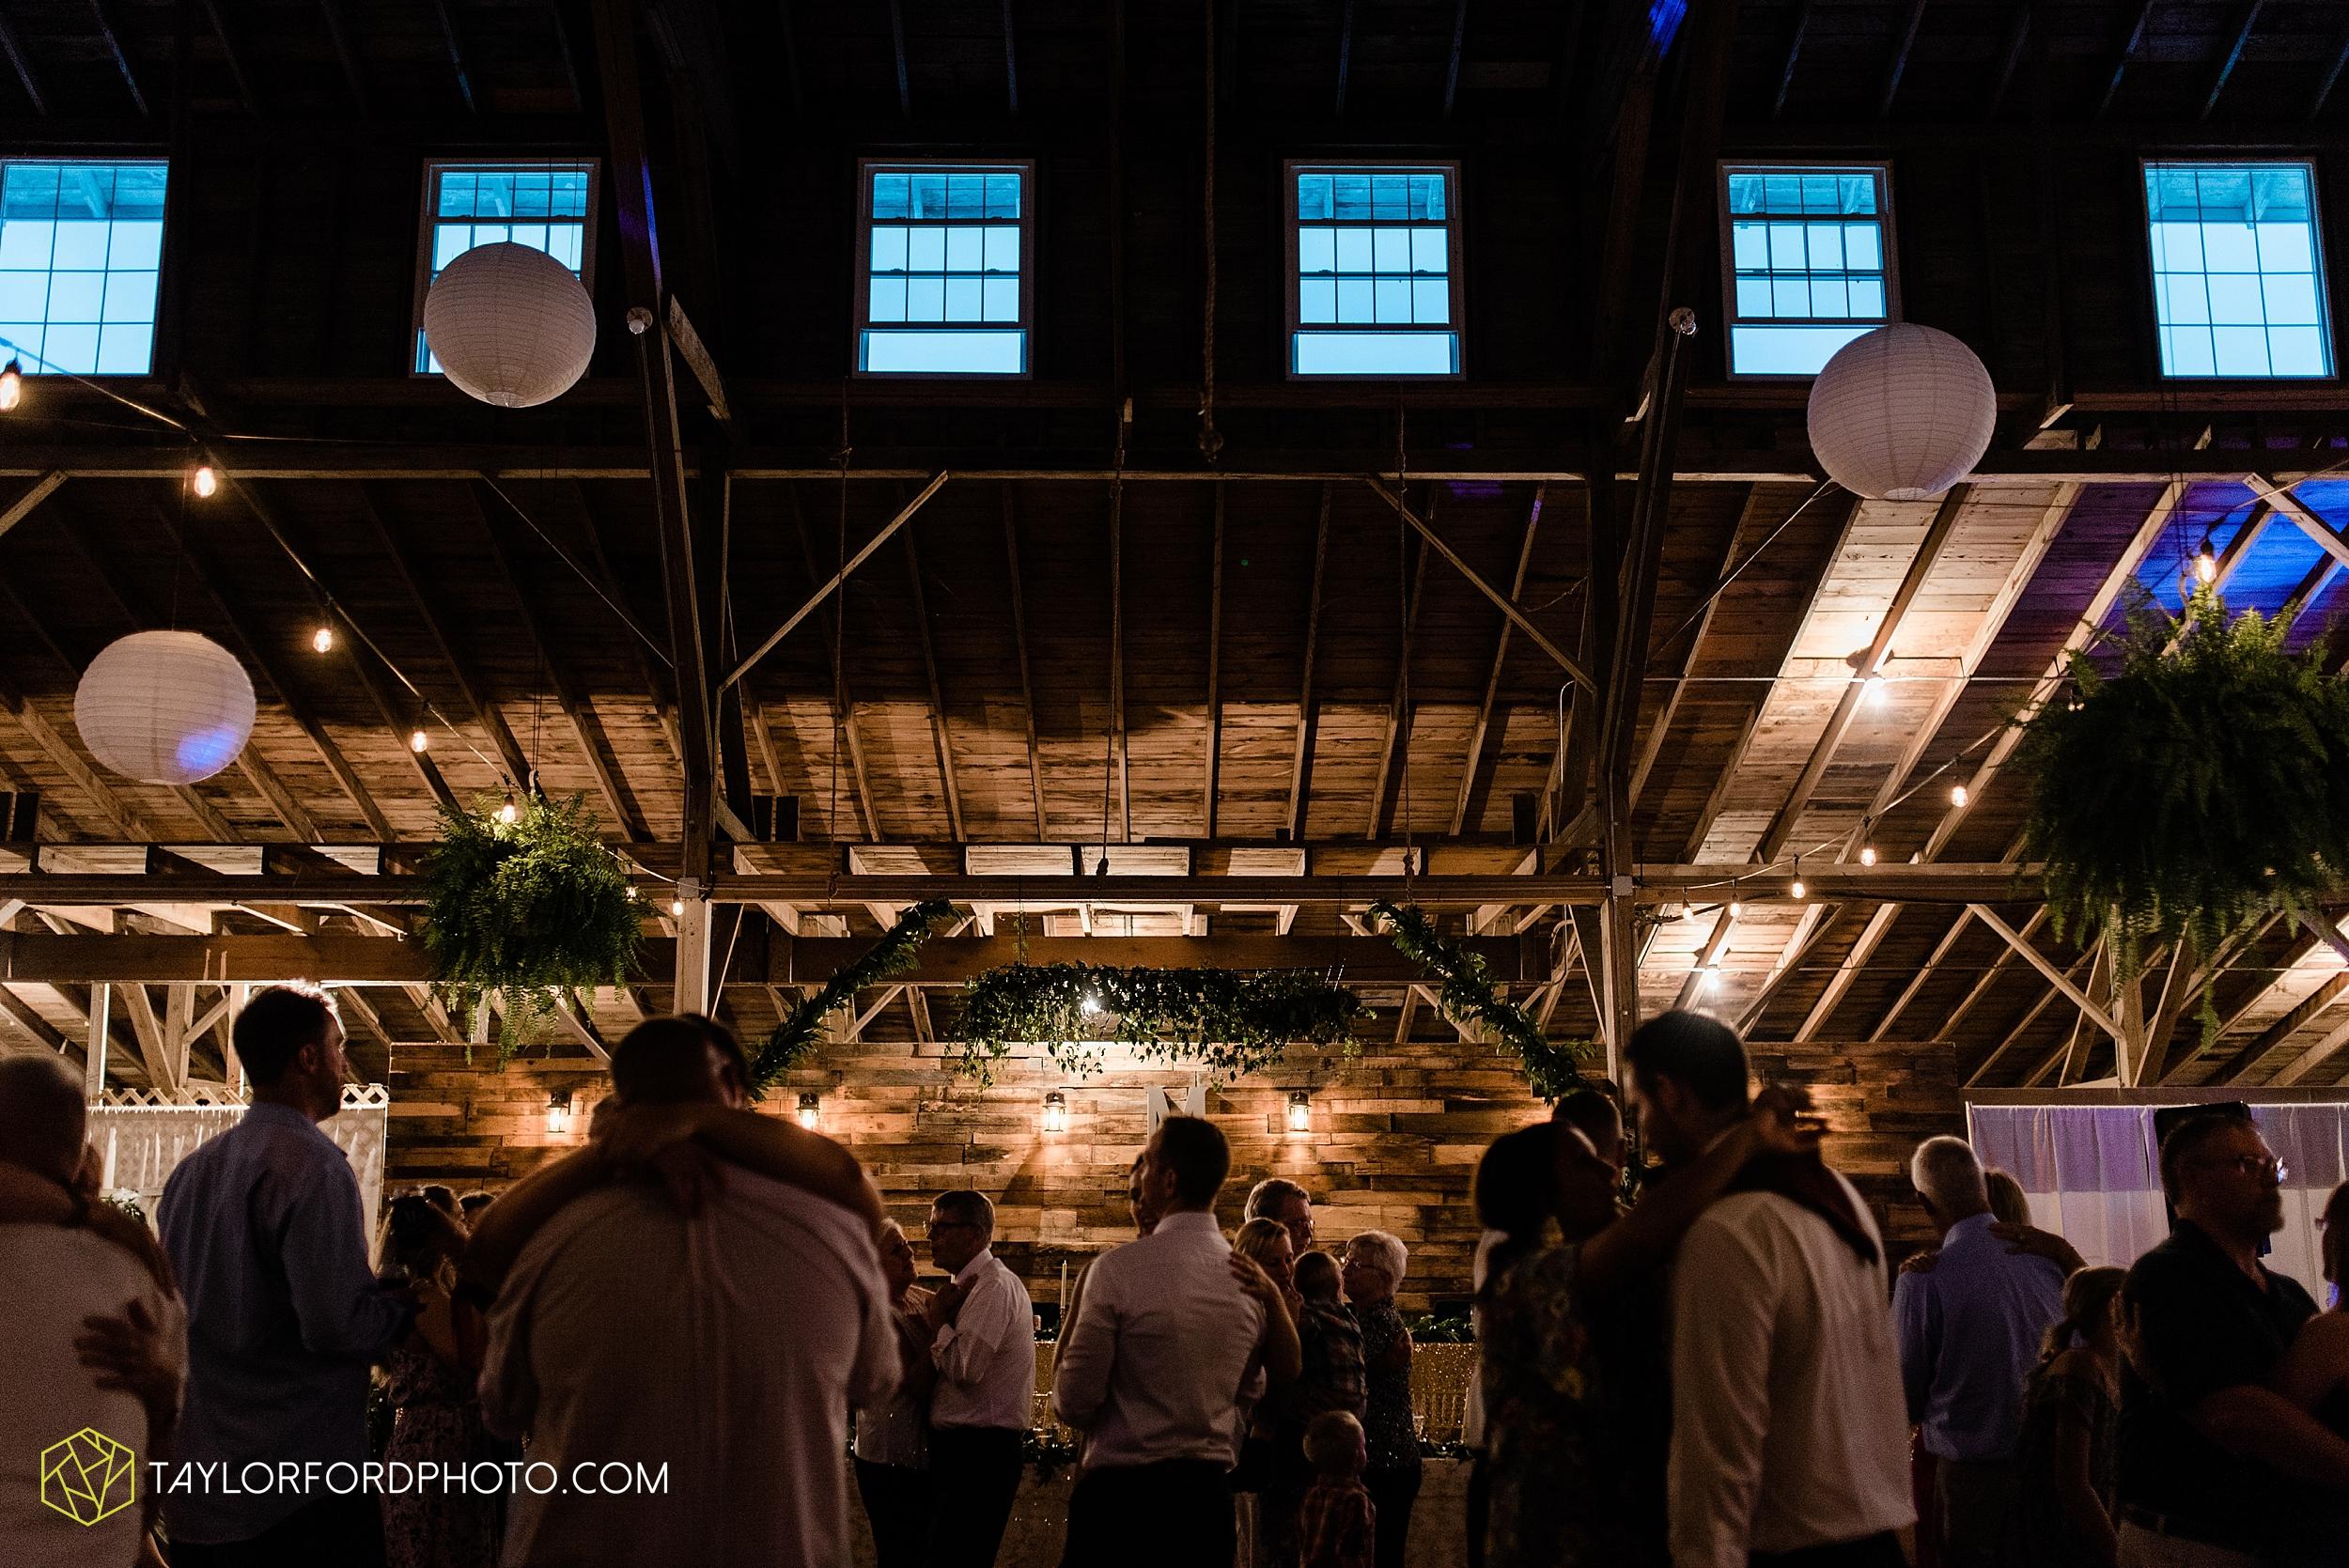 van-wert-ohio-first-united-methodist-church-county-dairy-barn-wedding-photographer-taylor-ford-photography_9888.jpg